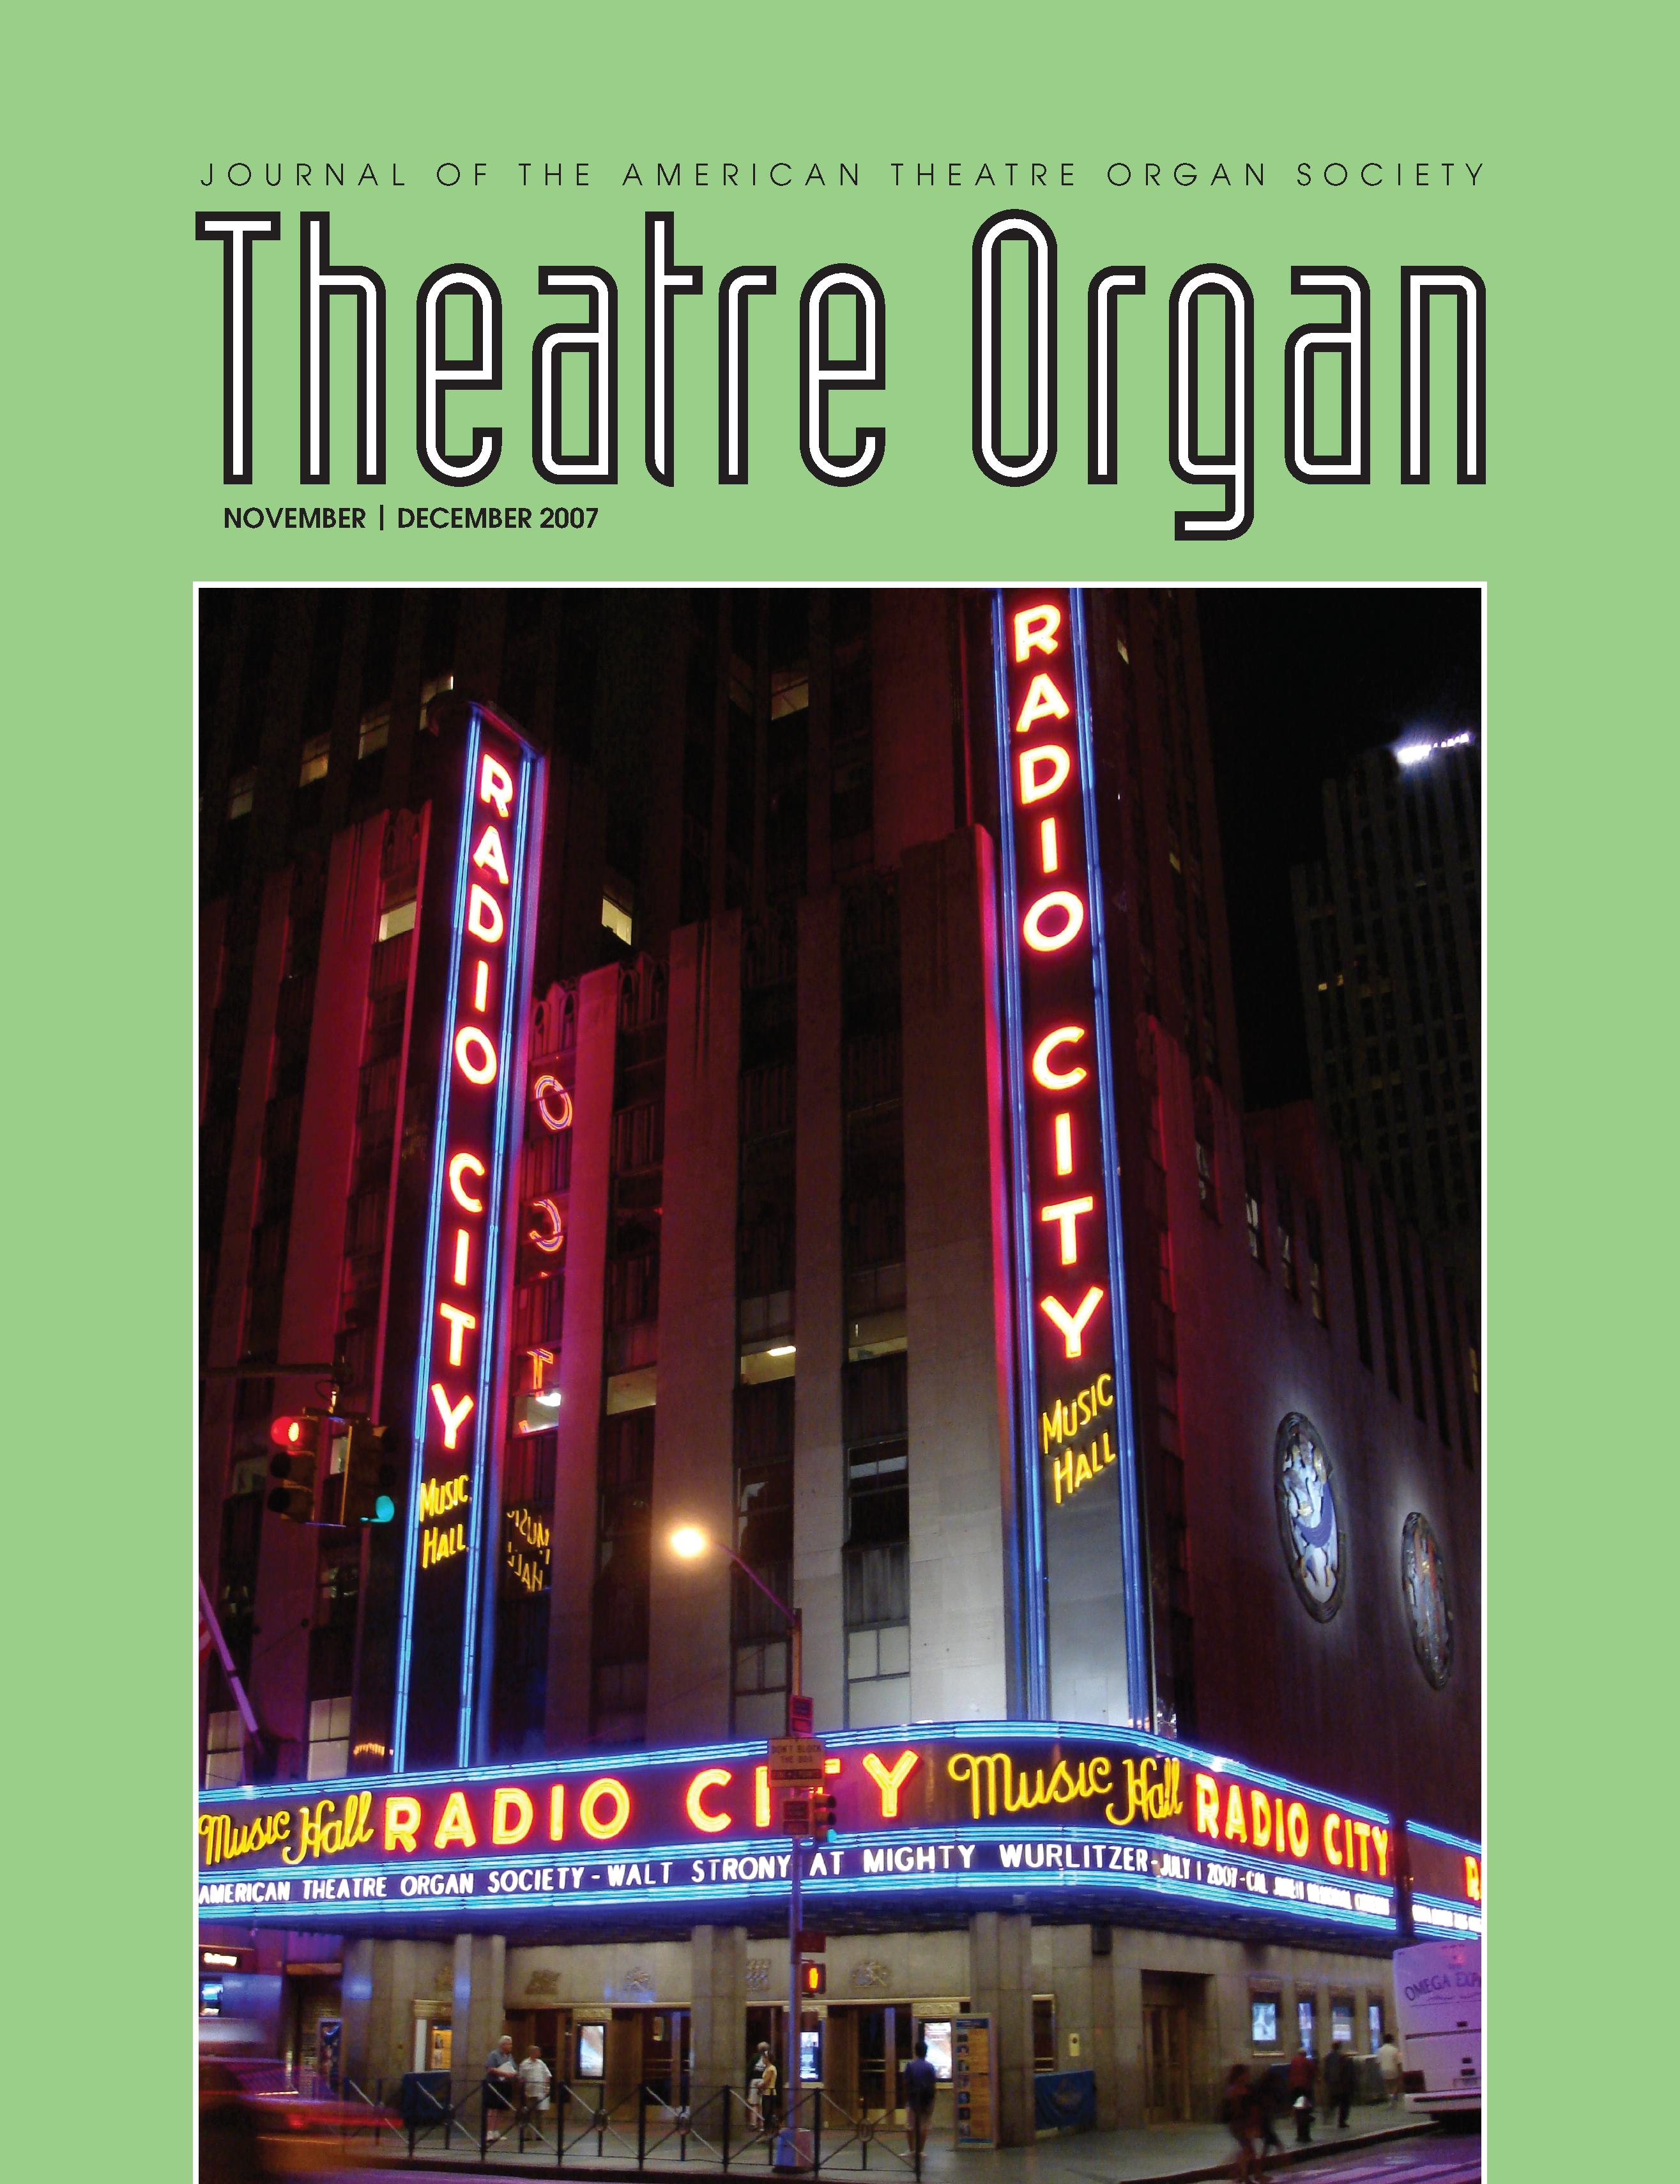 Theatre Organ, November - December 2007, Volume 49, Number 6